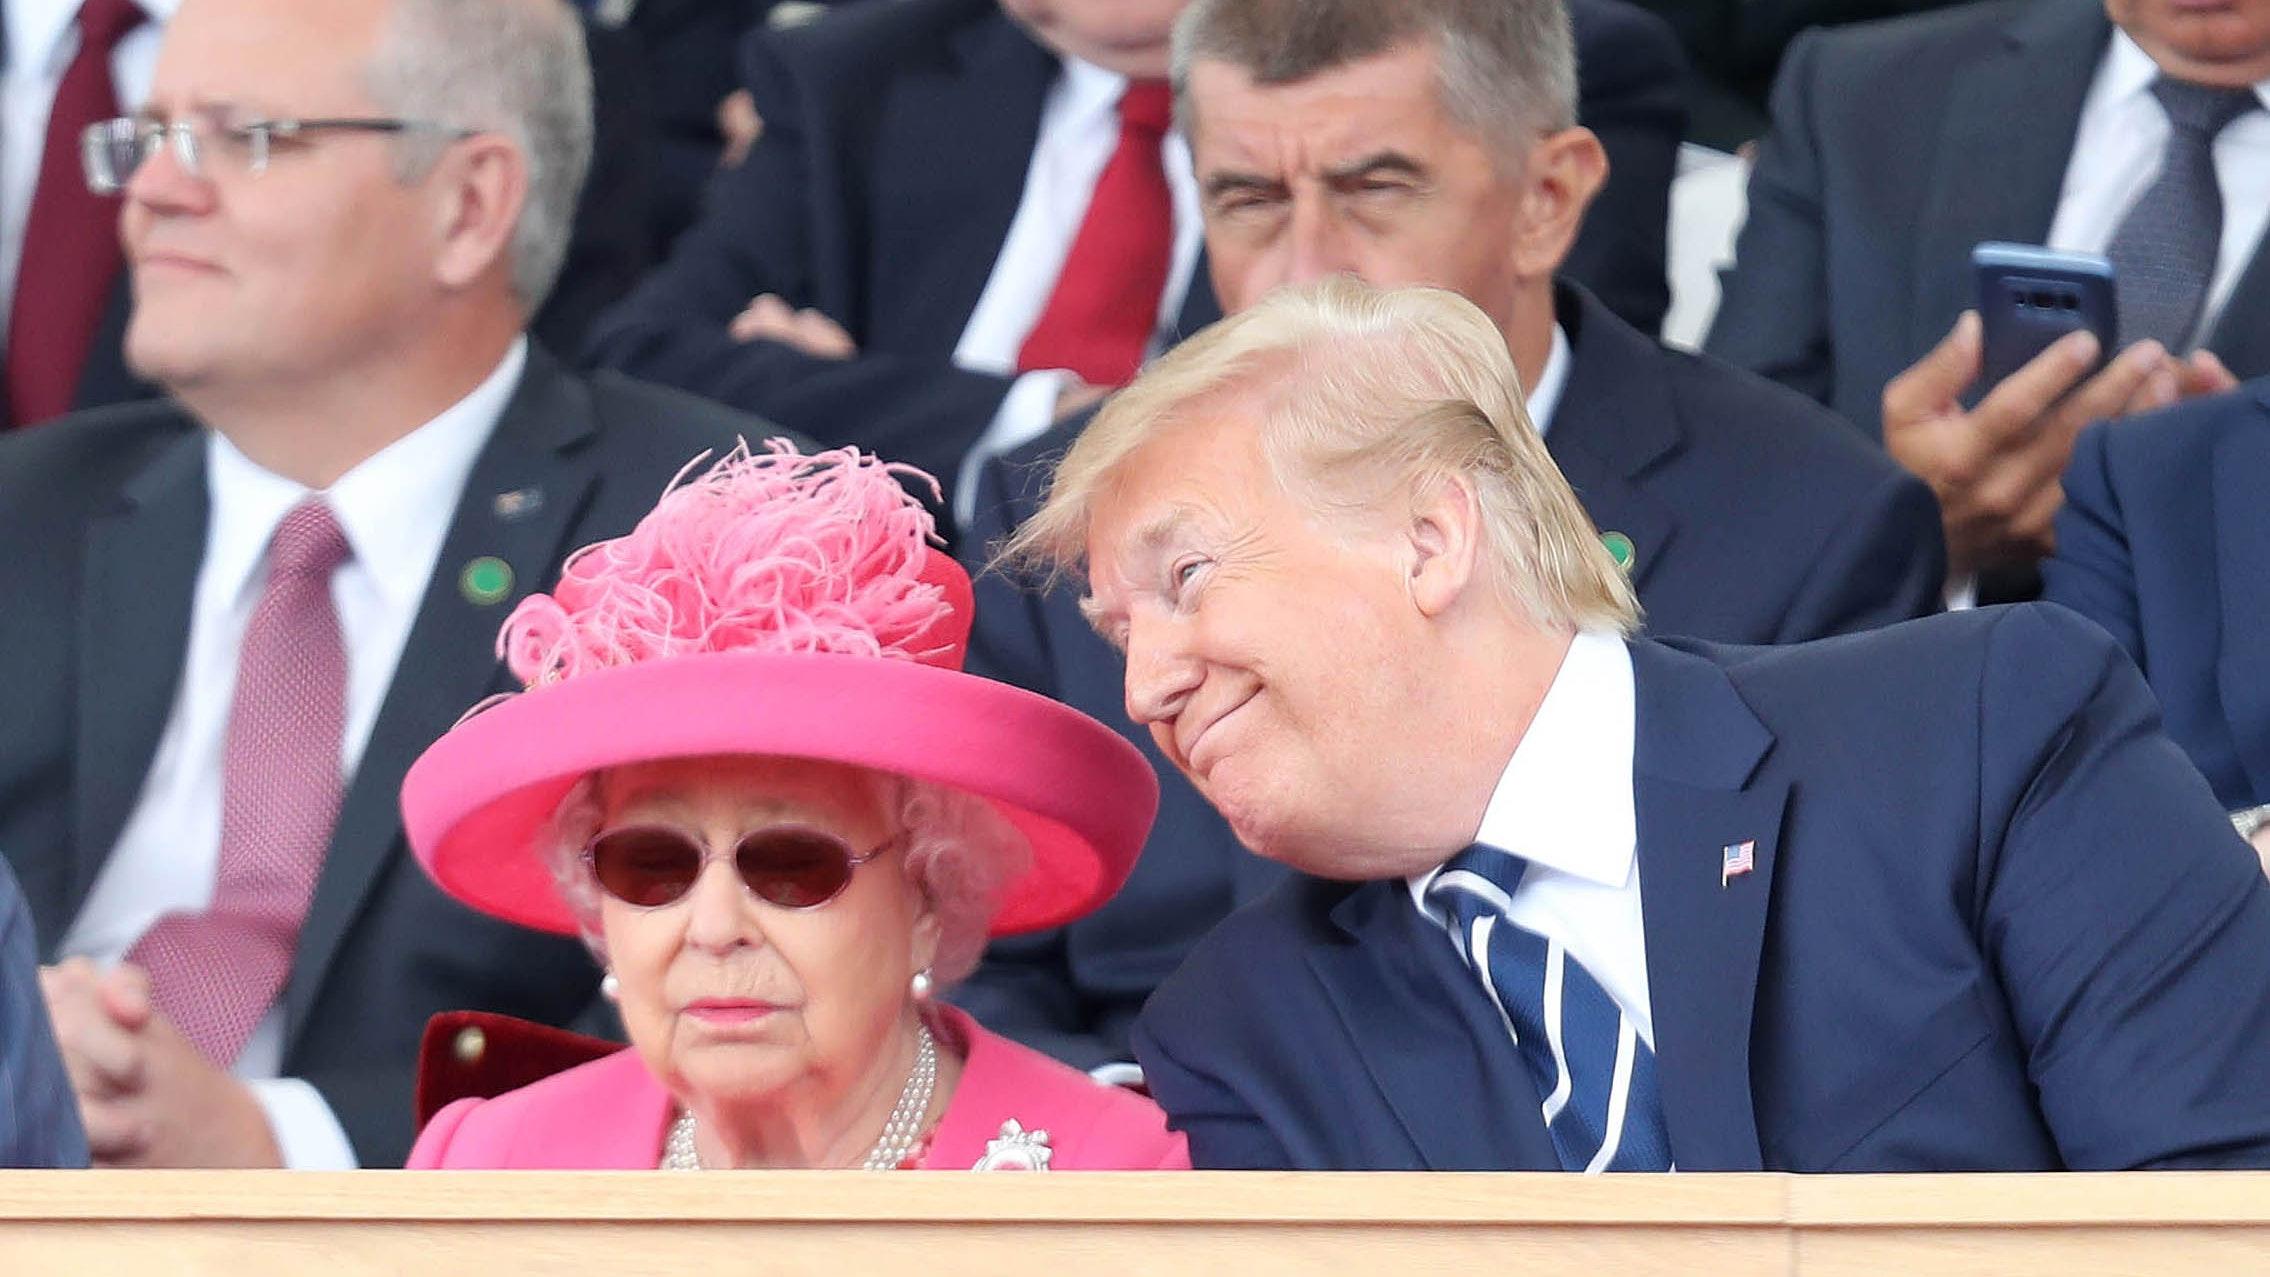 Trump calls London mayor 'stone cold loser' as he lands in Britain